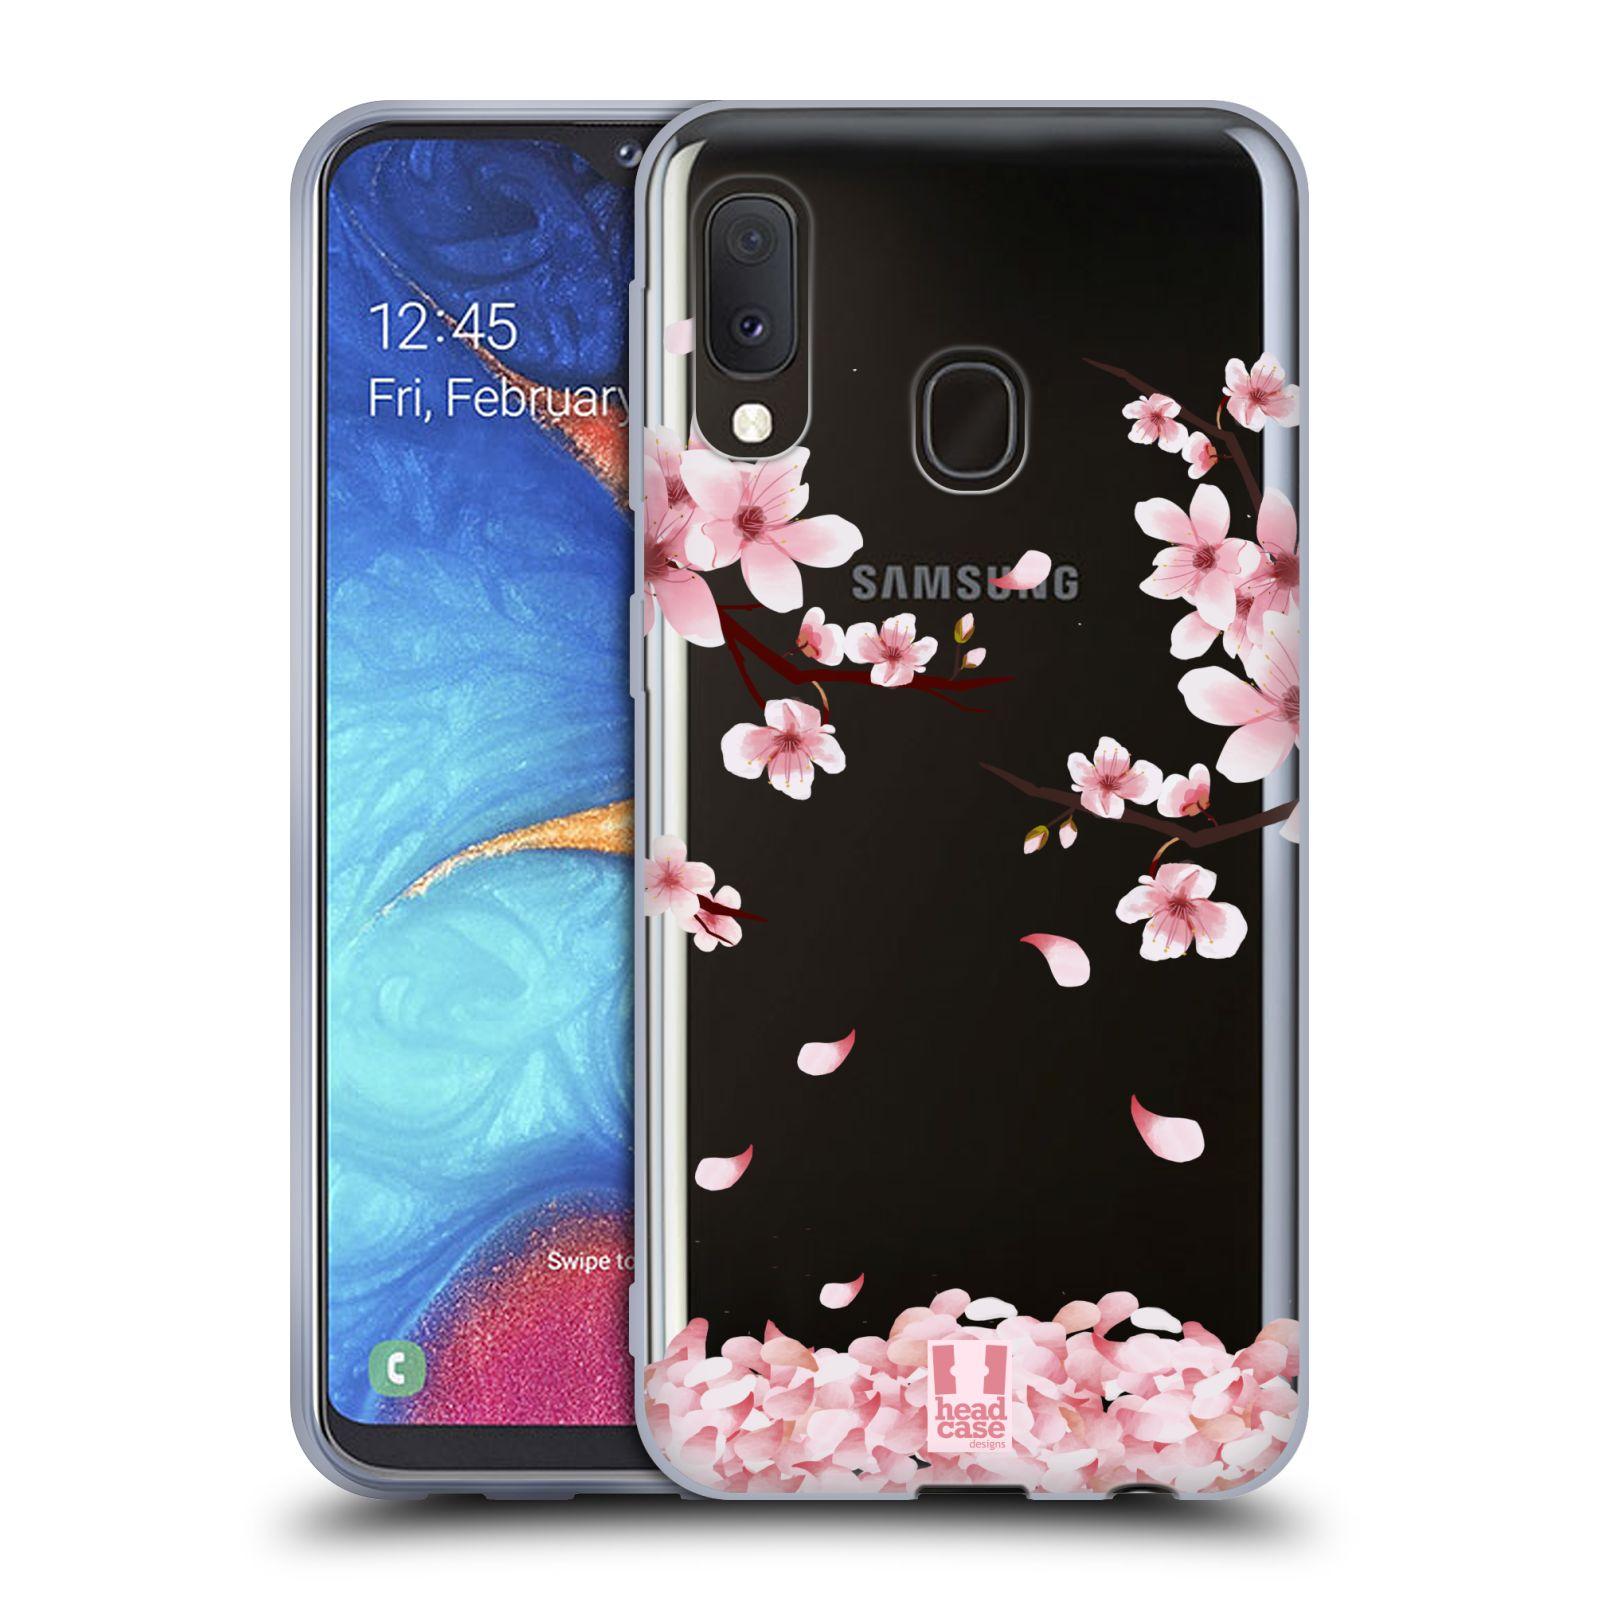 Silikonové pouzdro na mobil Samsung Galaxy A20e - Head Case - Květy a větvičky